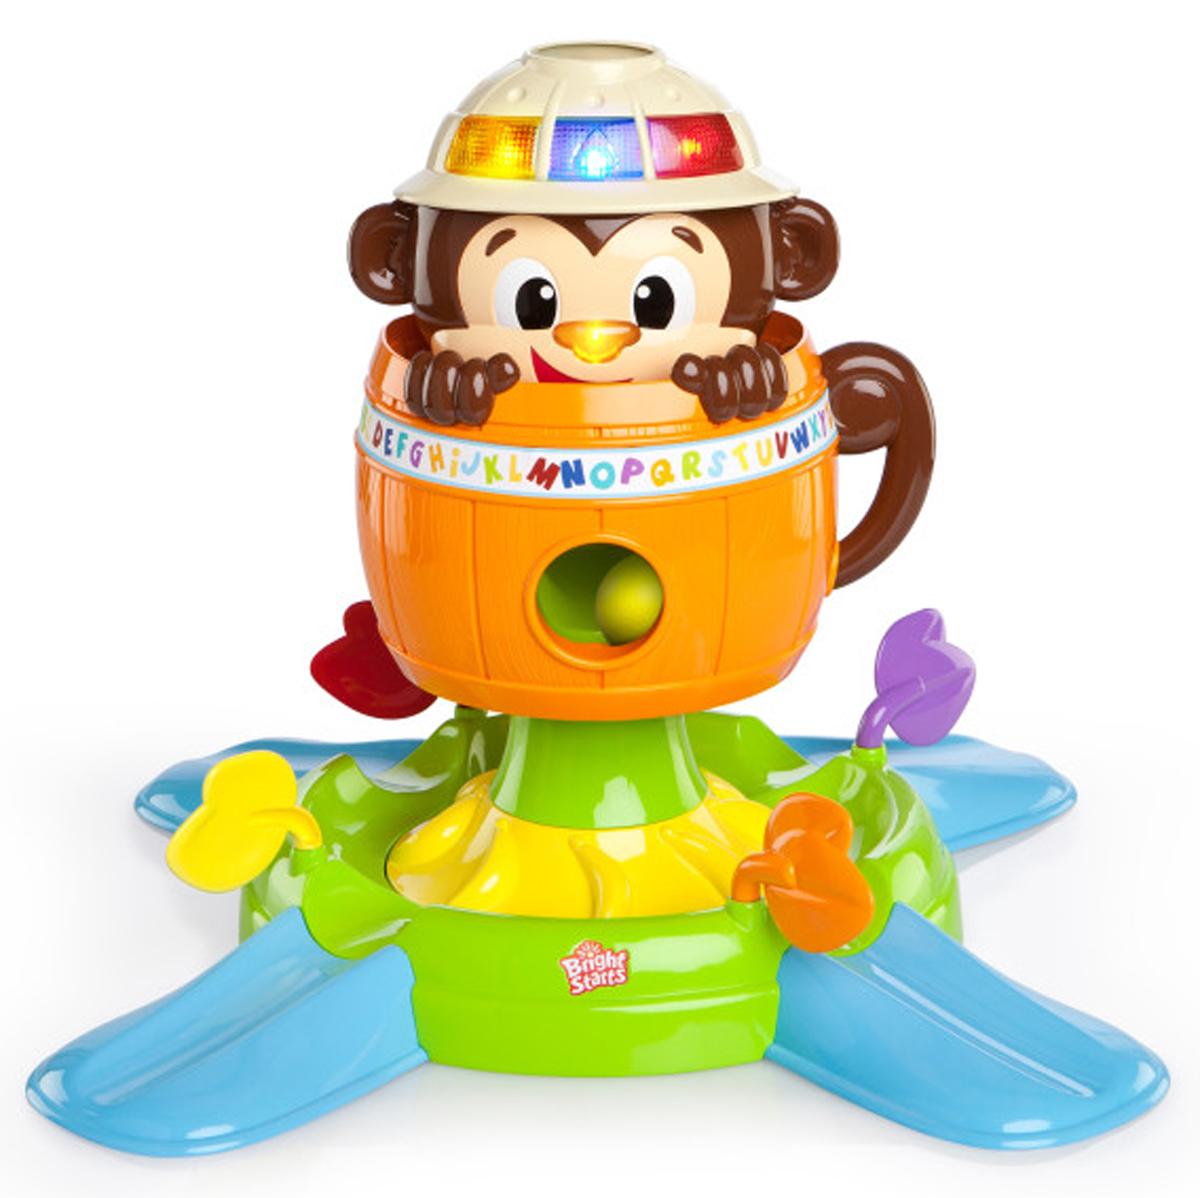 Bright Starts Развивающая игрушка Обезьянка в бочке развивающие игрушки bright starts развивающая игрушка bright starts обезьянка на кольцах